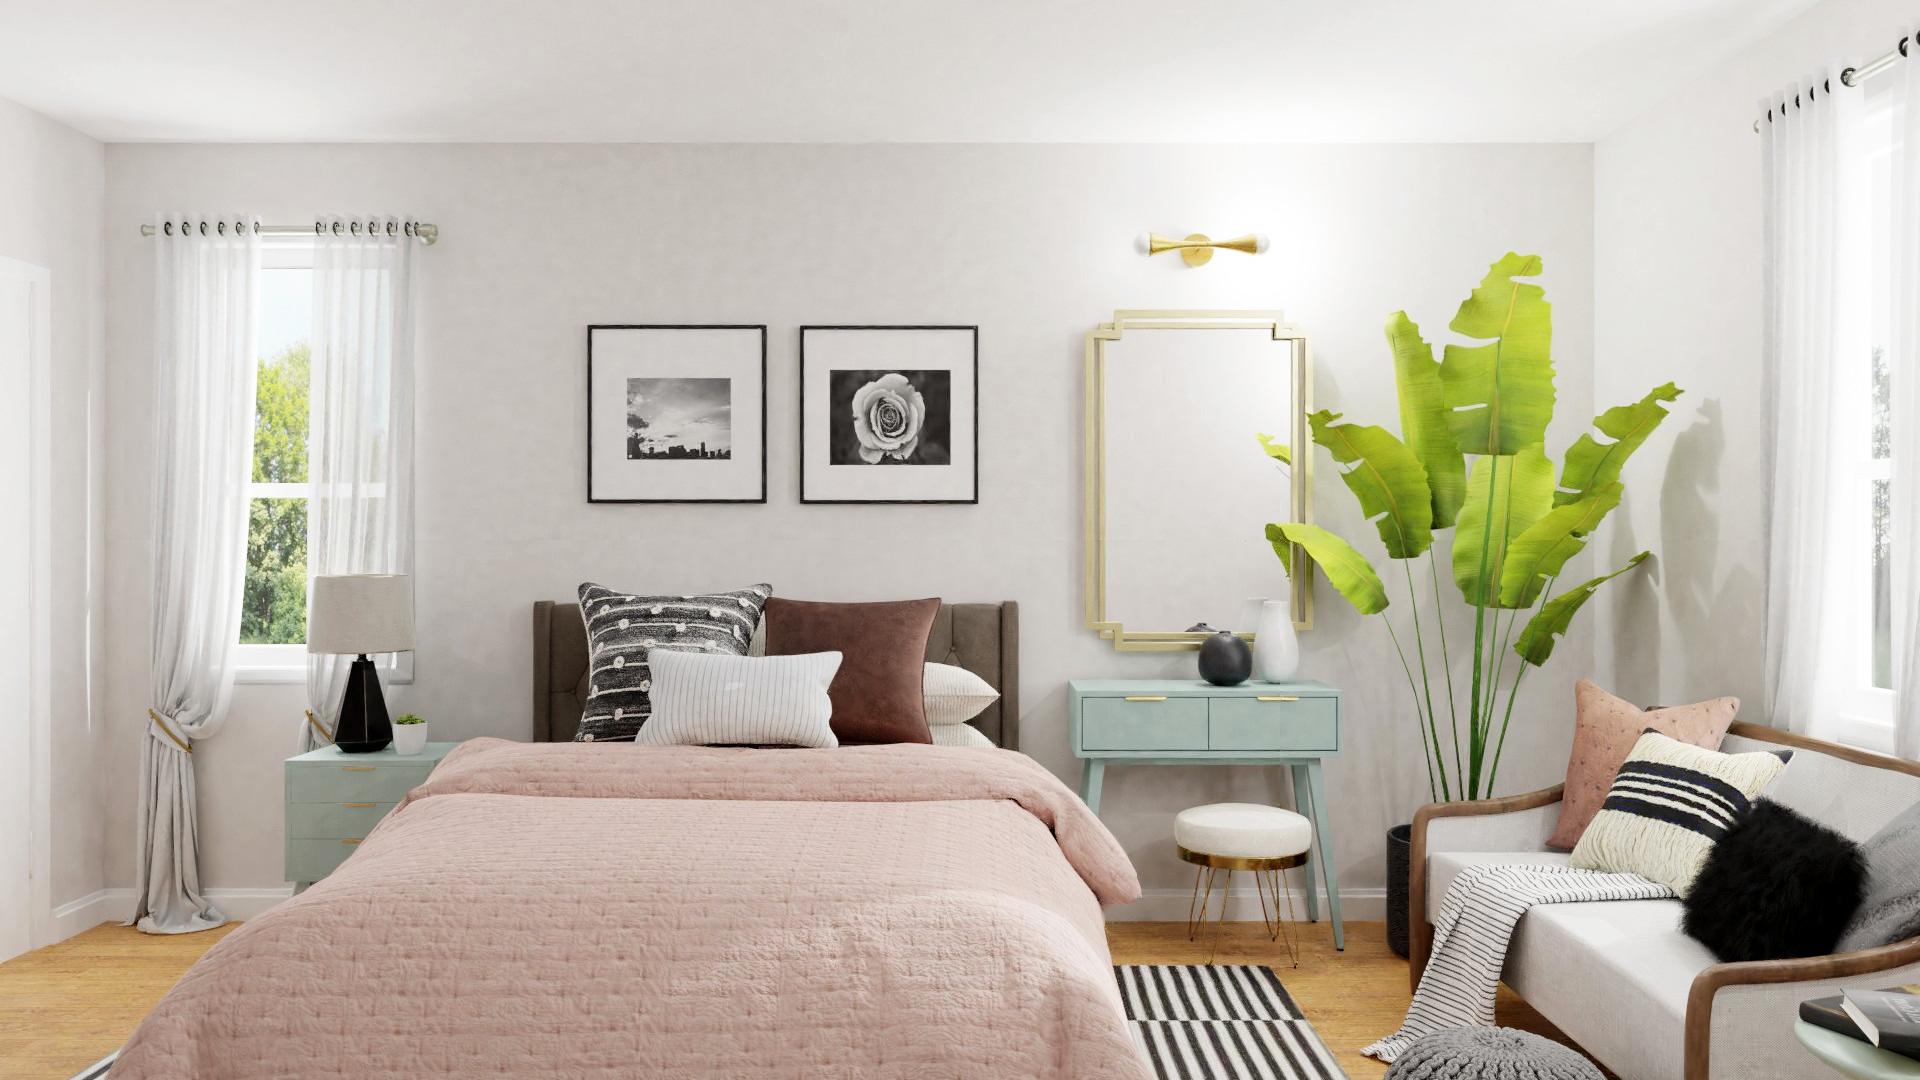 Bedroom in pastel colors